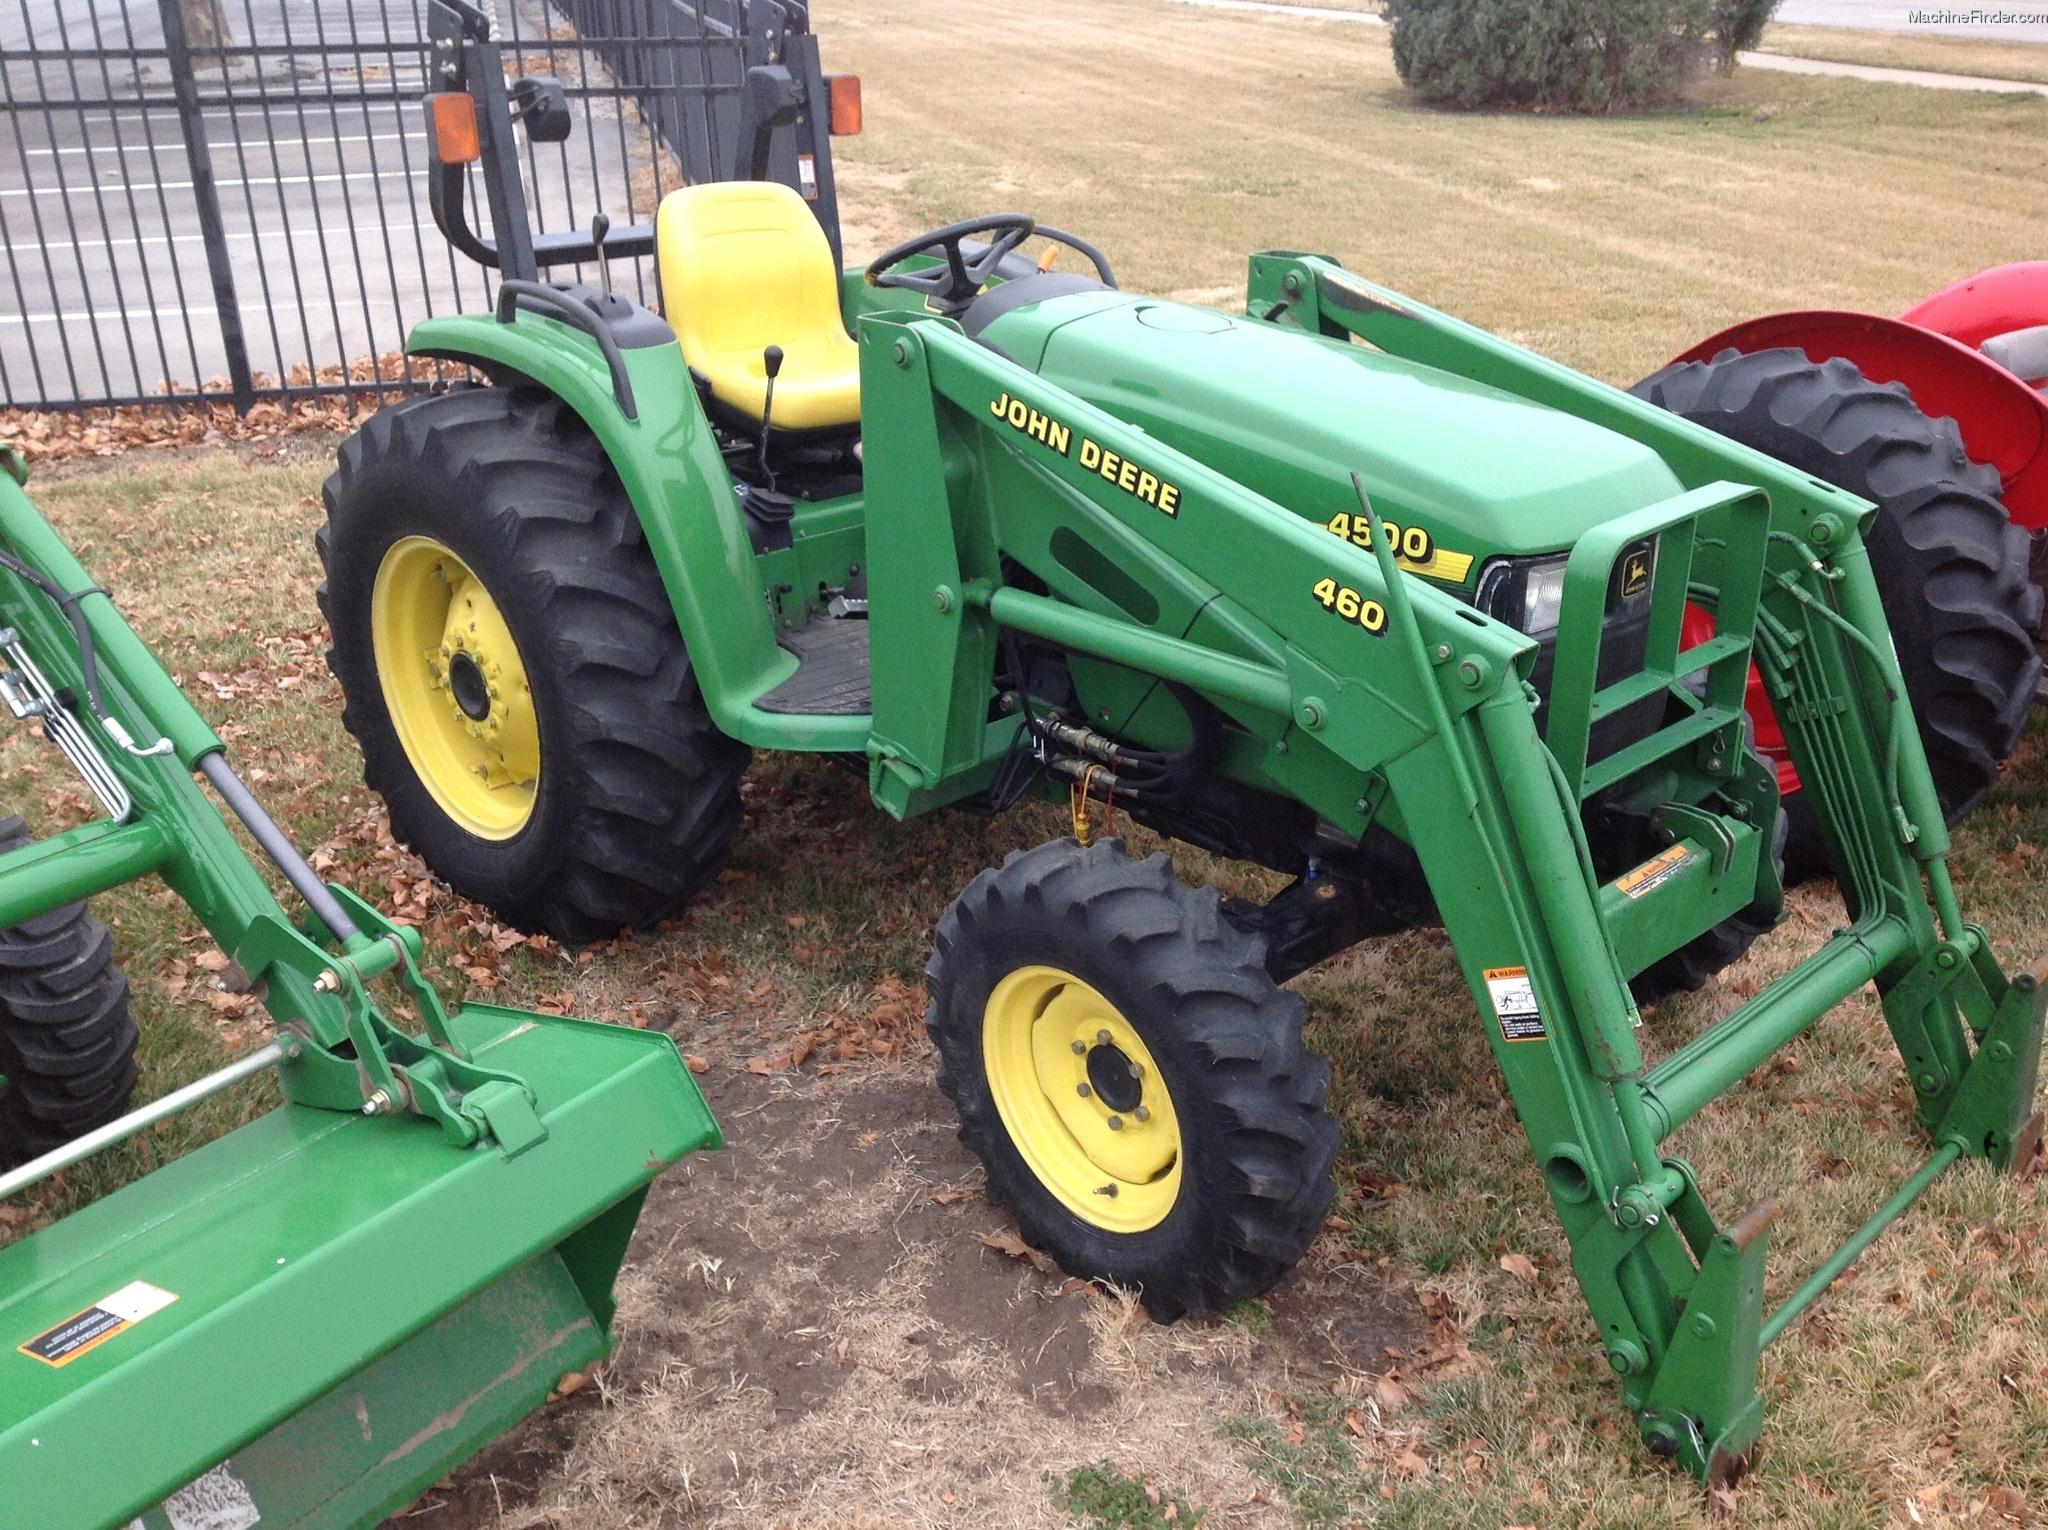 2000 John Deere 4500 Tractors - Compact (1-40hp.) - John ...